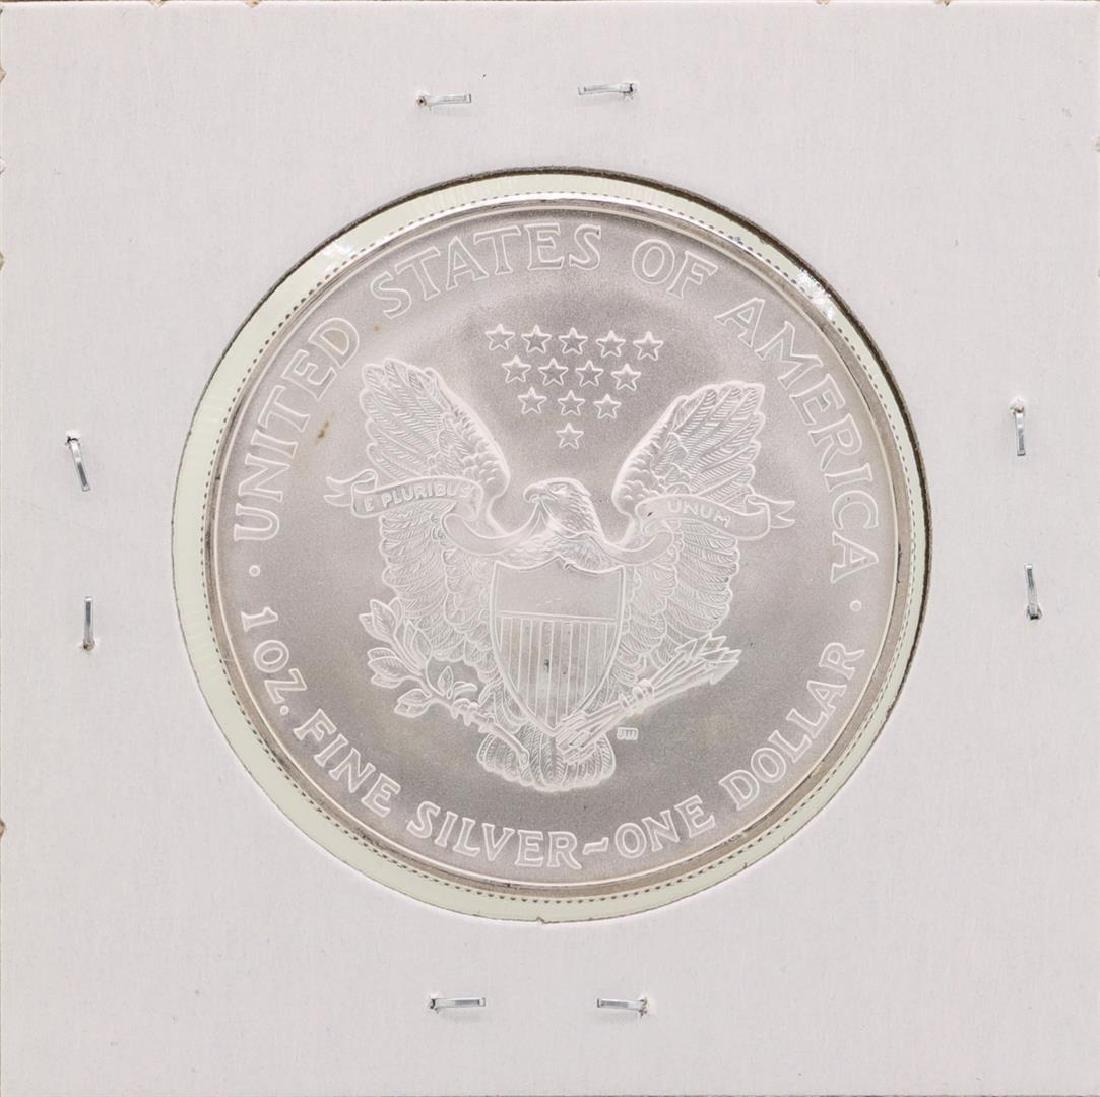 2005 $1 American Silver Eagle Coin - 2